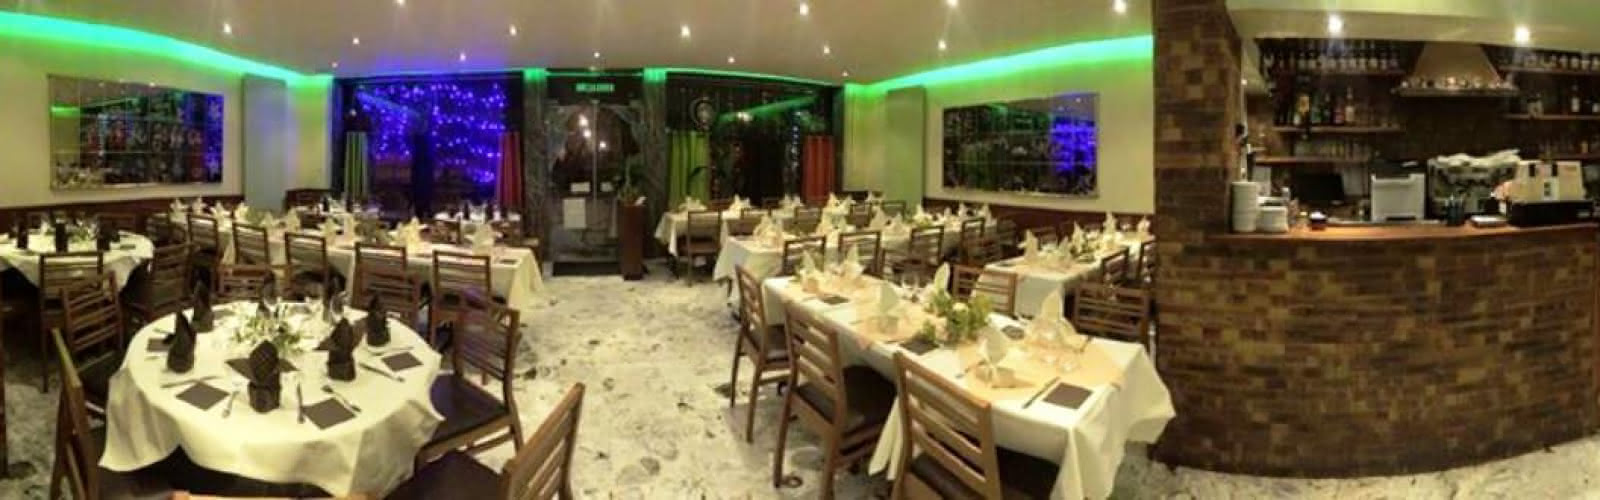 Restaurant Borsalino, Bezons